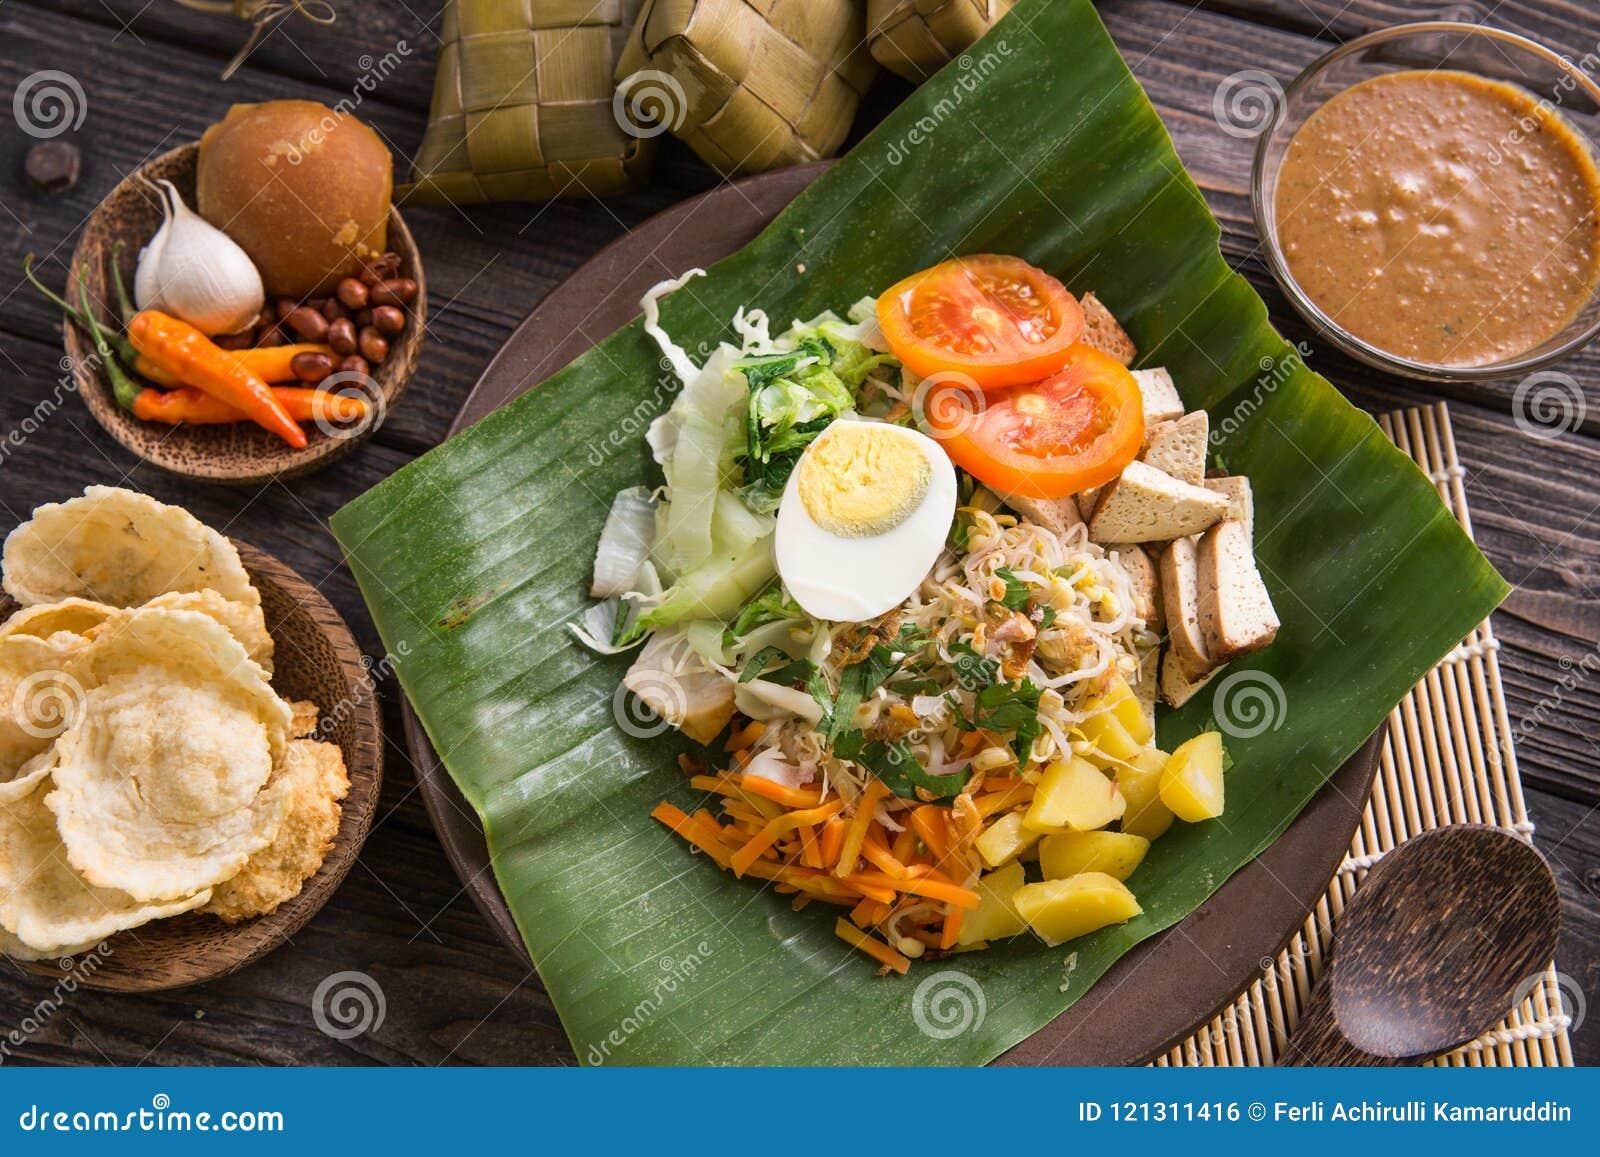 Gado Gado Famous Indonesian Tradtional Dish Stock Photo Image Of Green Fresh 121311416